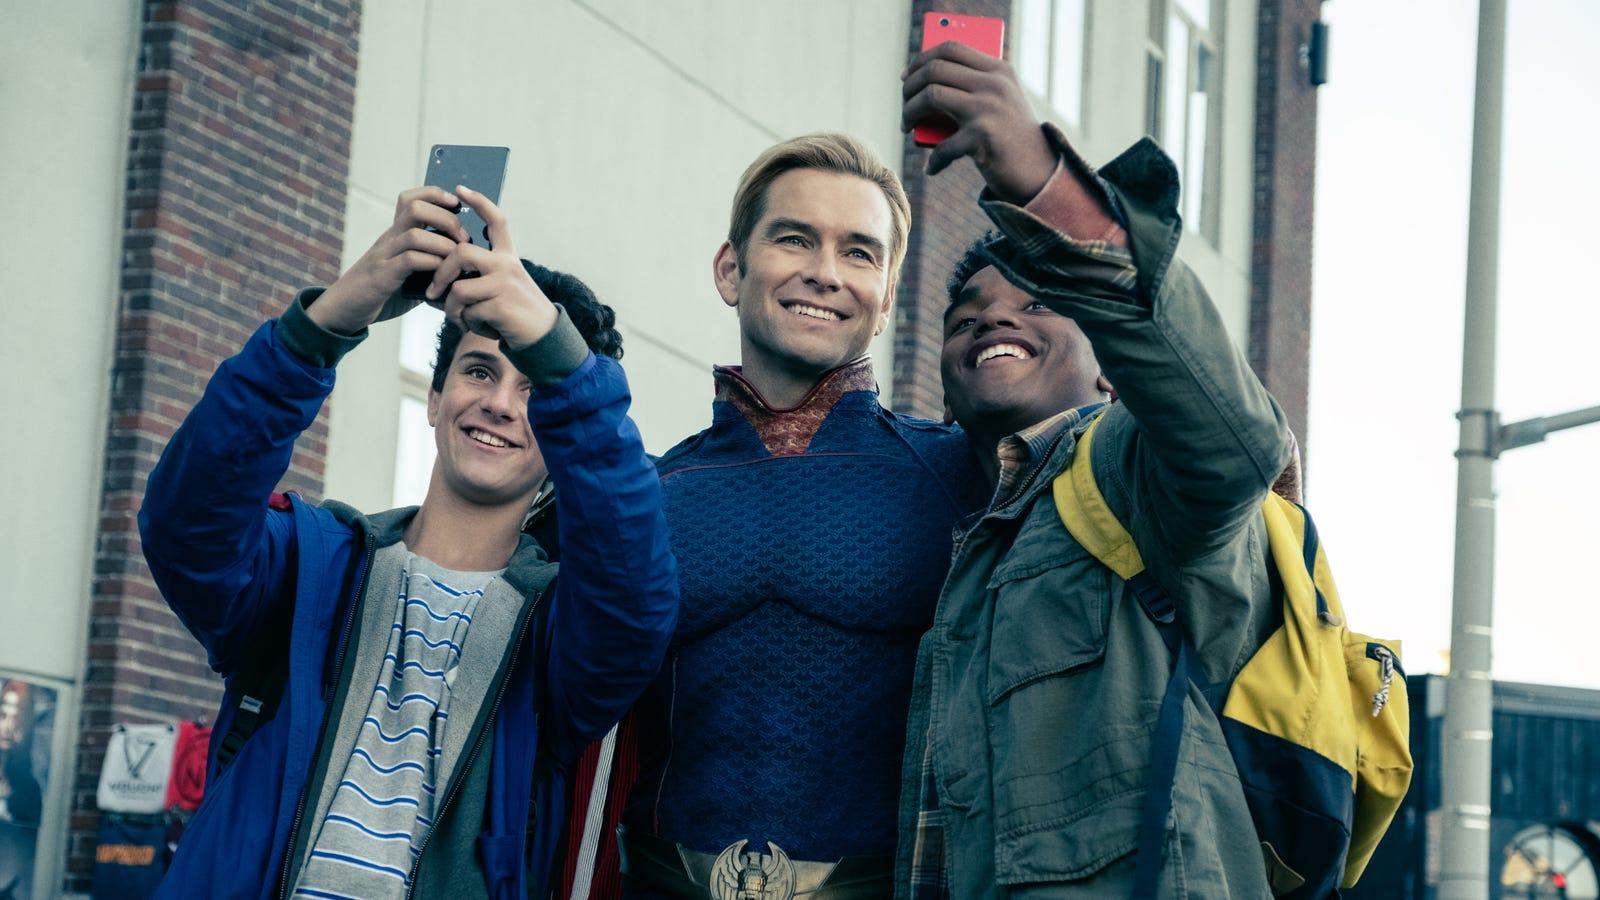 The Boys illustrates the limits of onscreen superhero satire